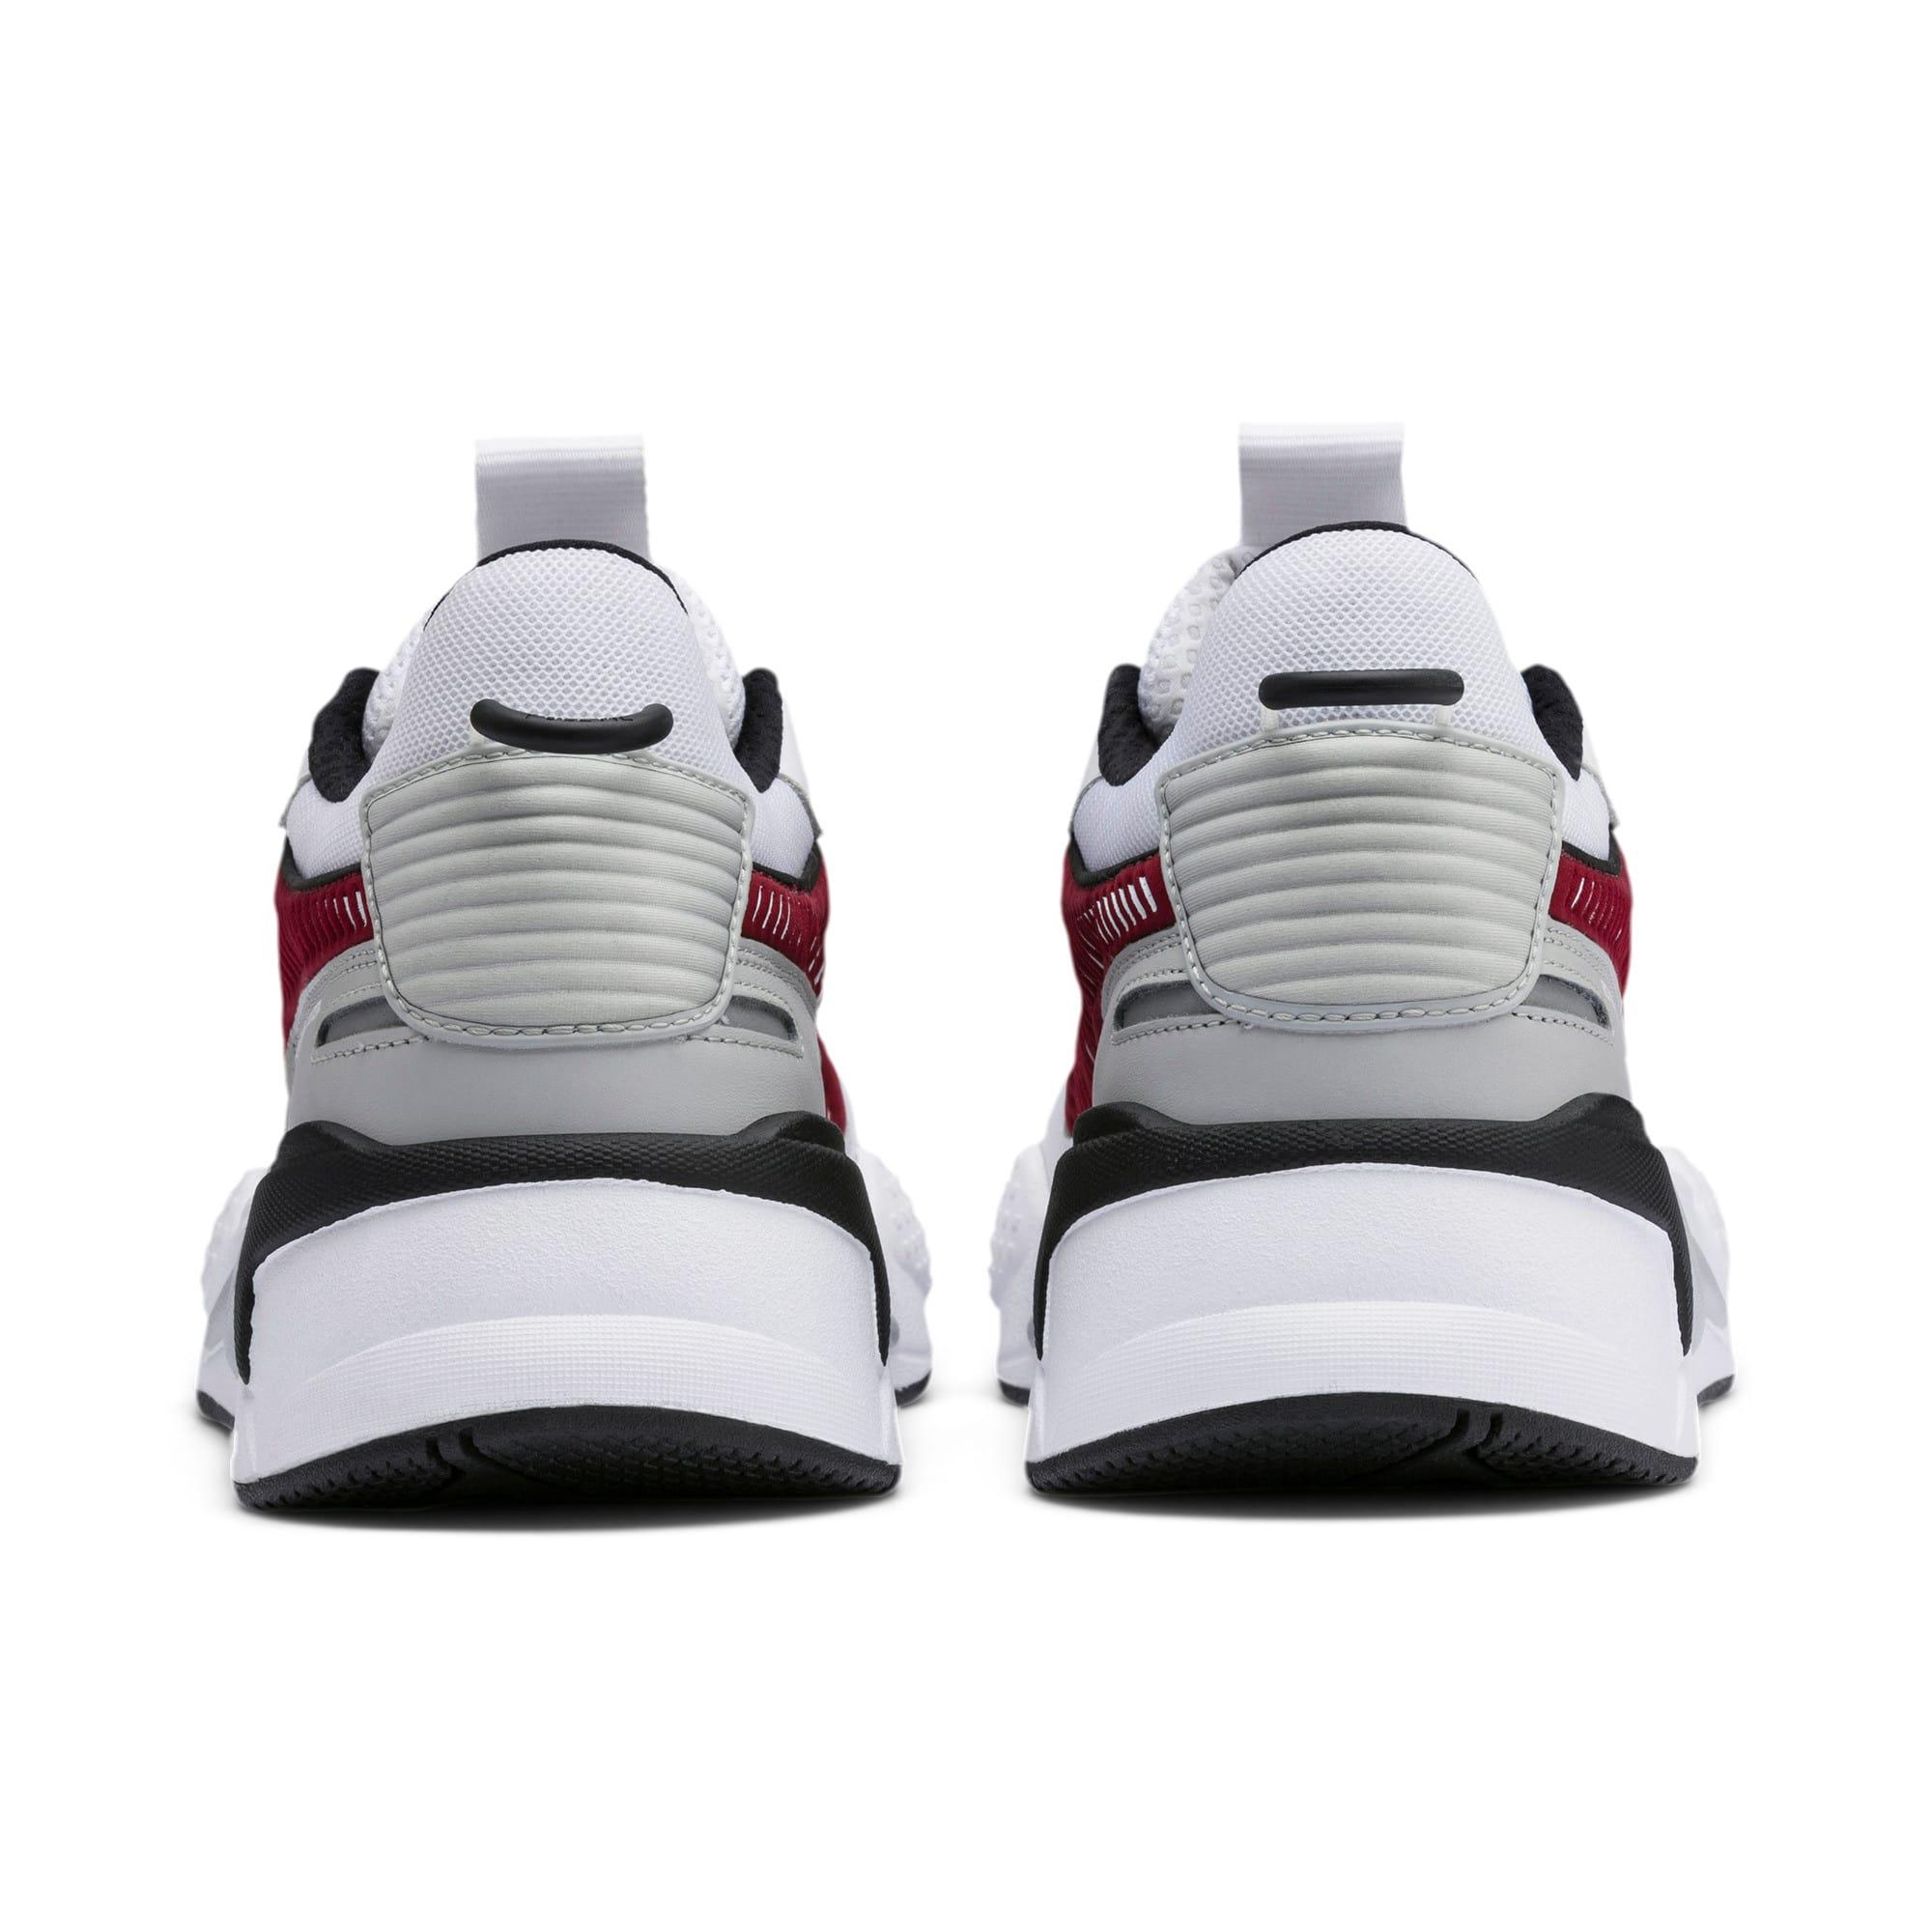 Thumbnail 4 of RS-X Core Sneakers, Puma White-Rhubarb, medium